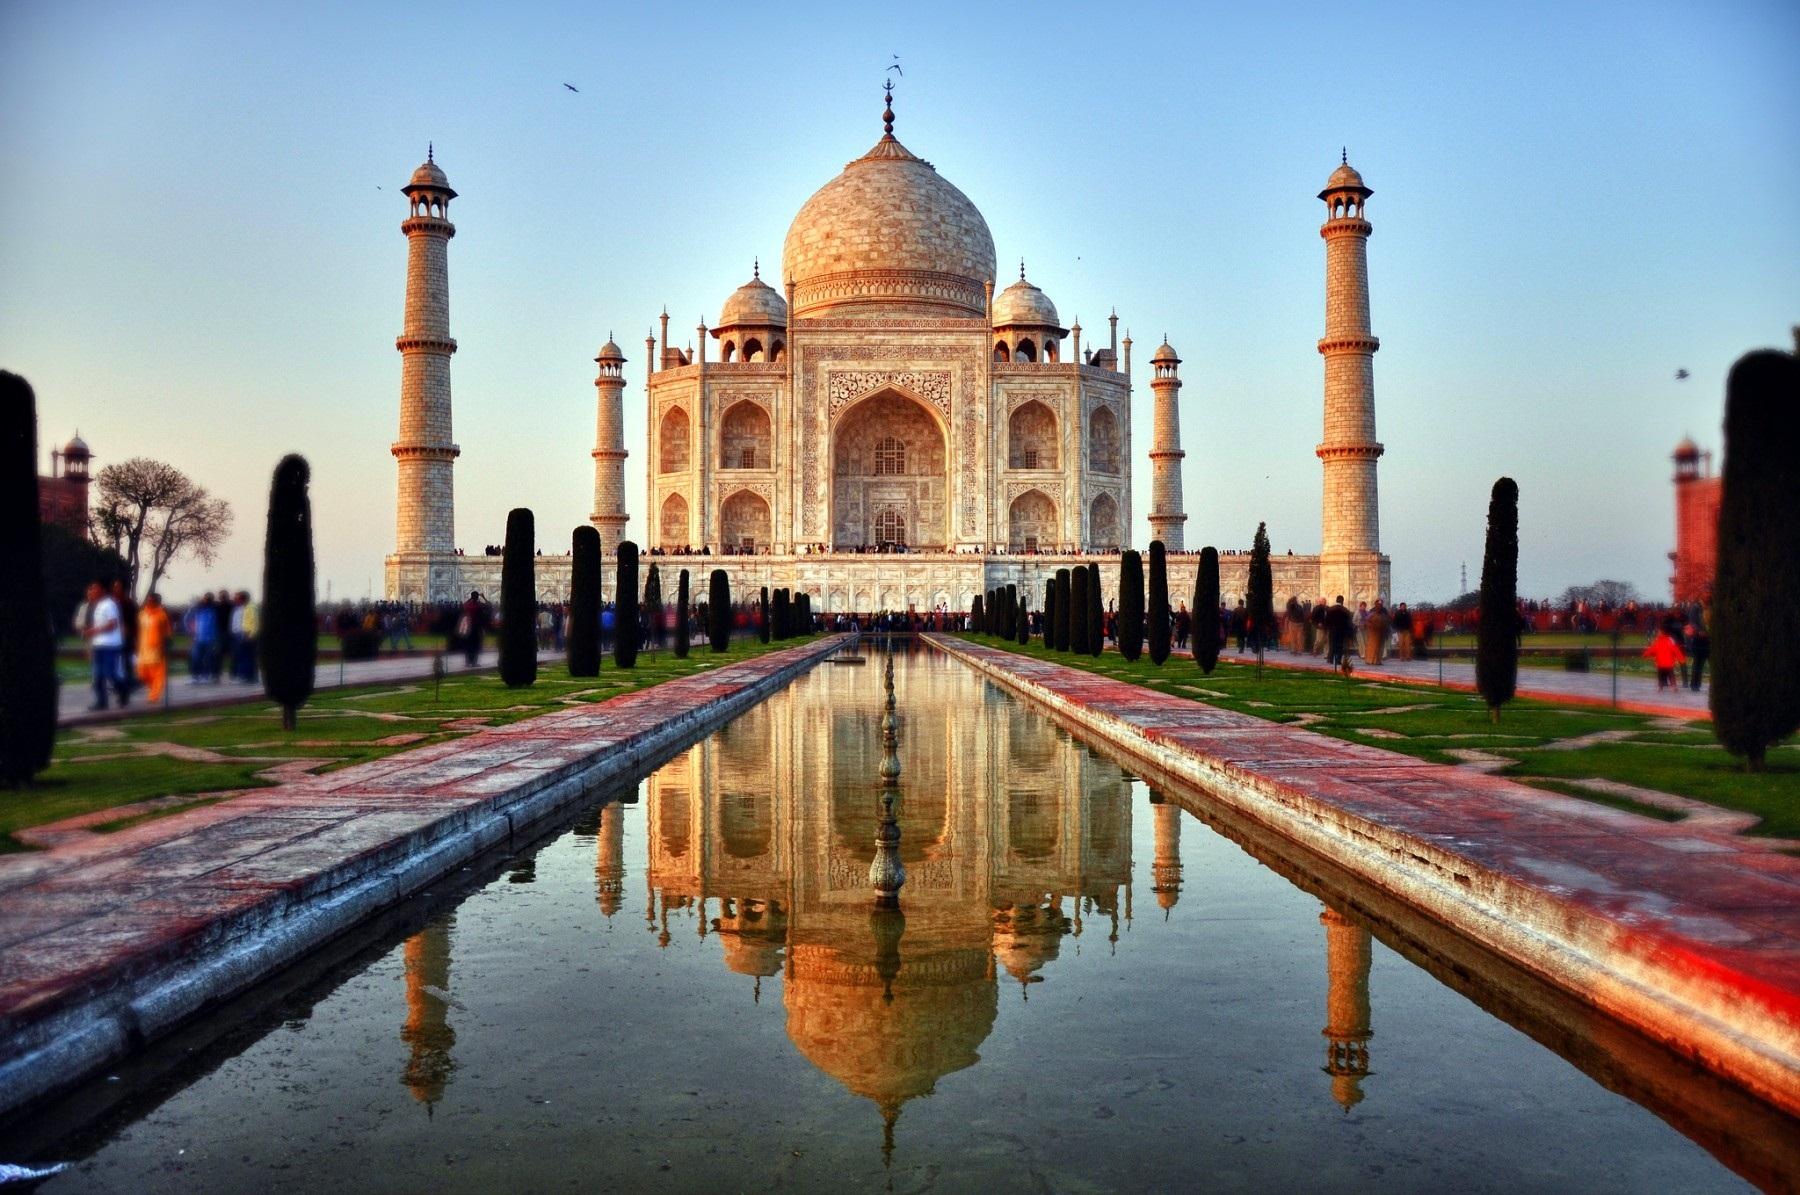 taj-mahal-india - Cópia